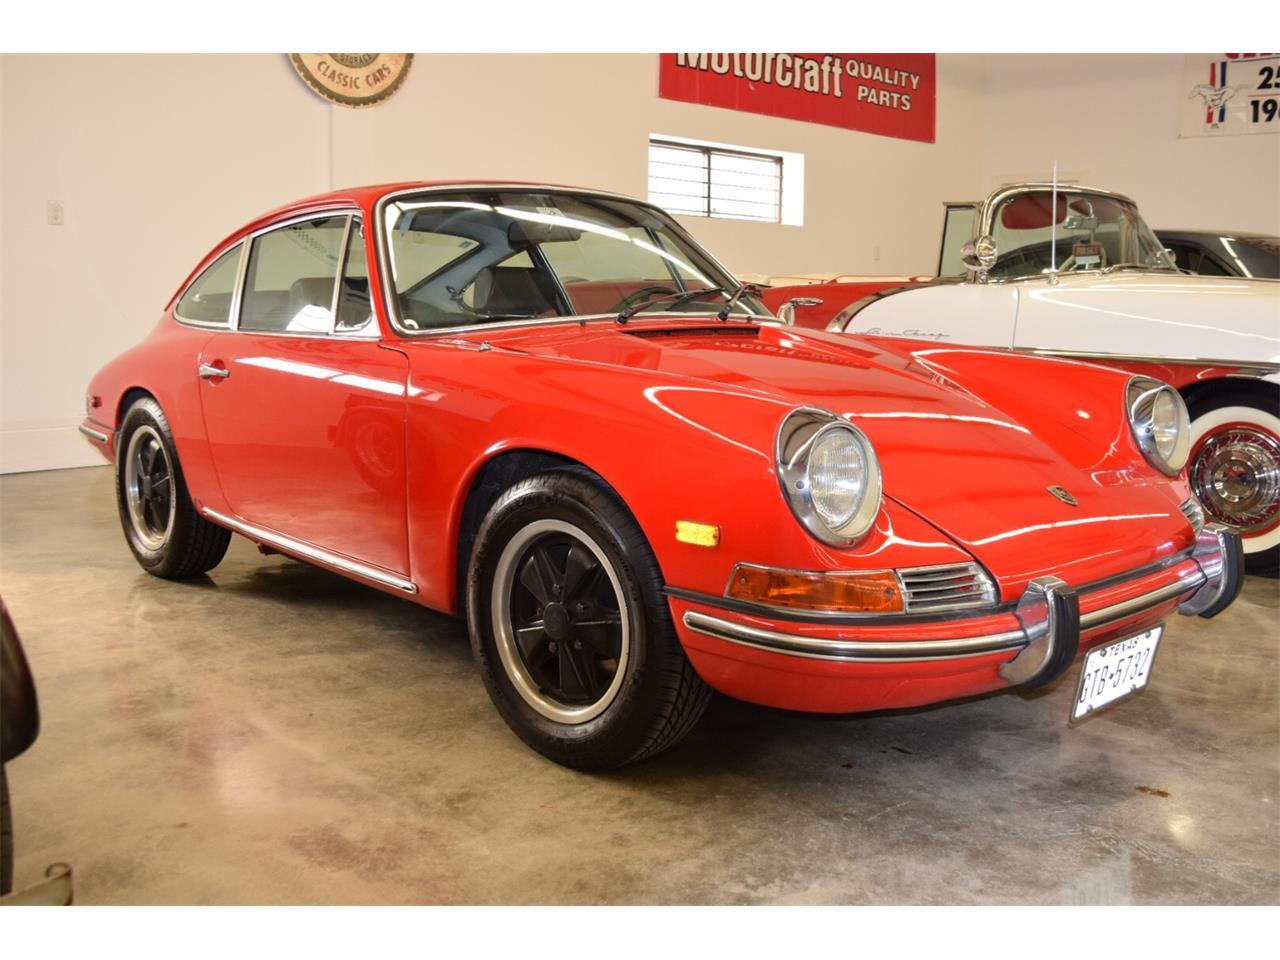 Classic Cars For Sale Houston Area: 1968 Porsche 912 For Sale